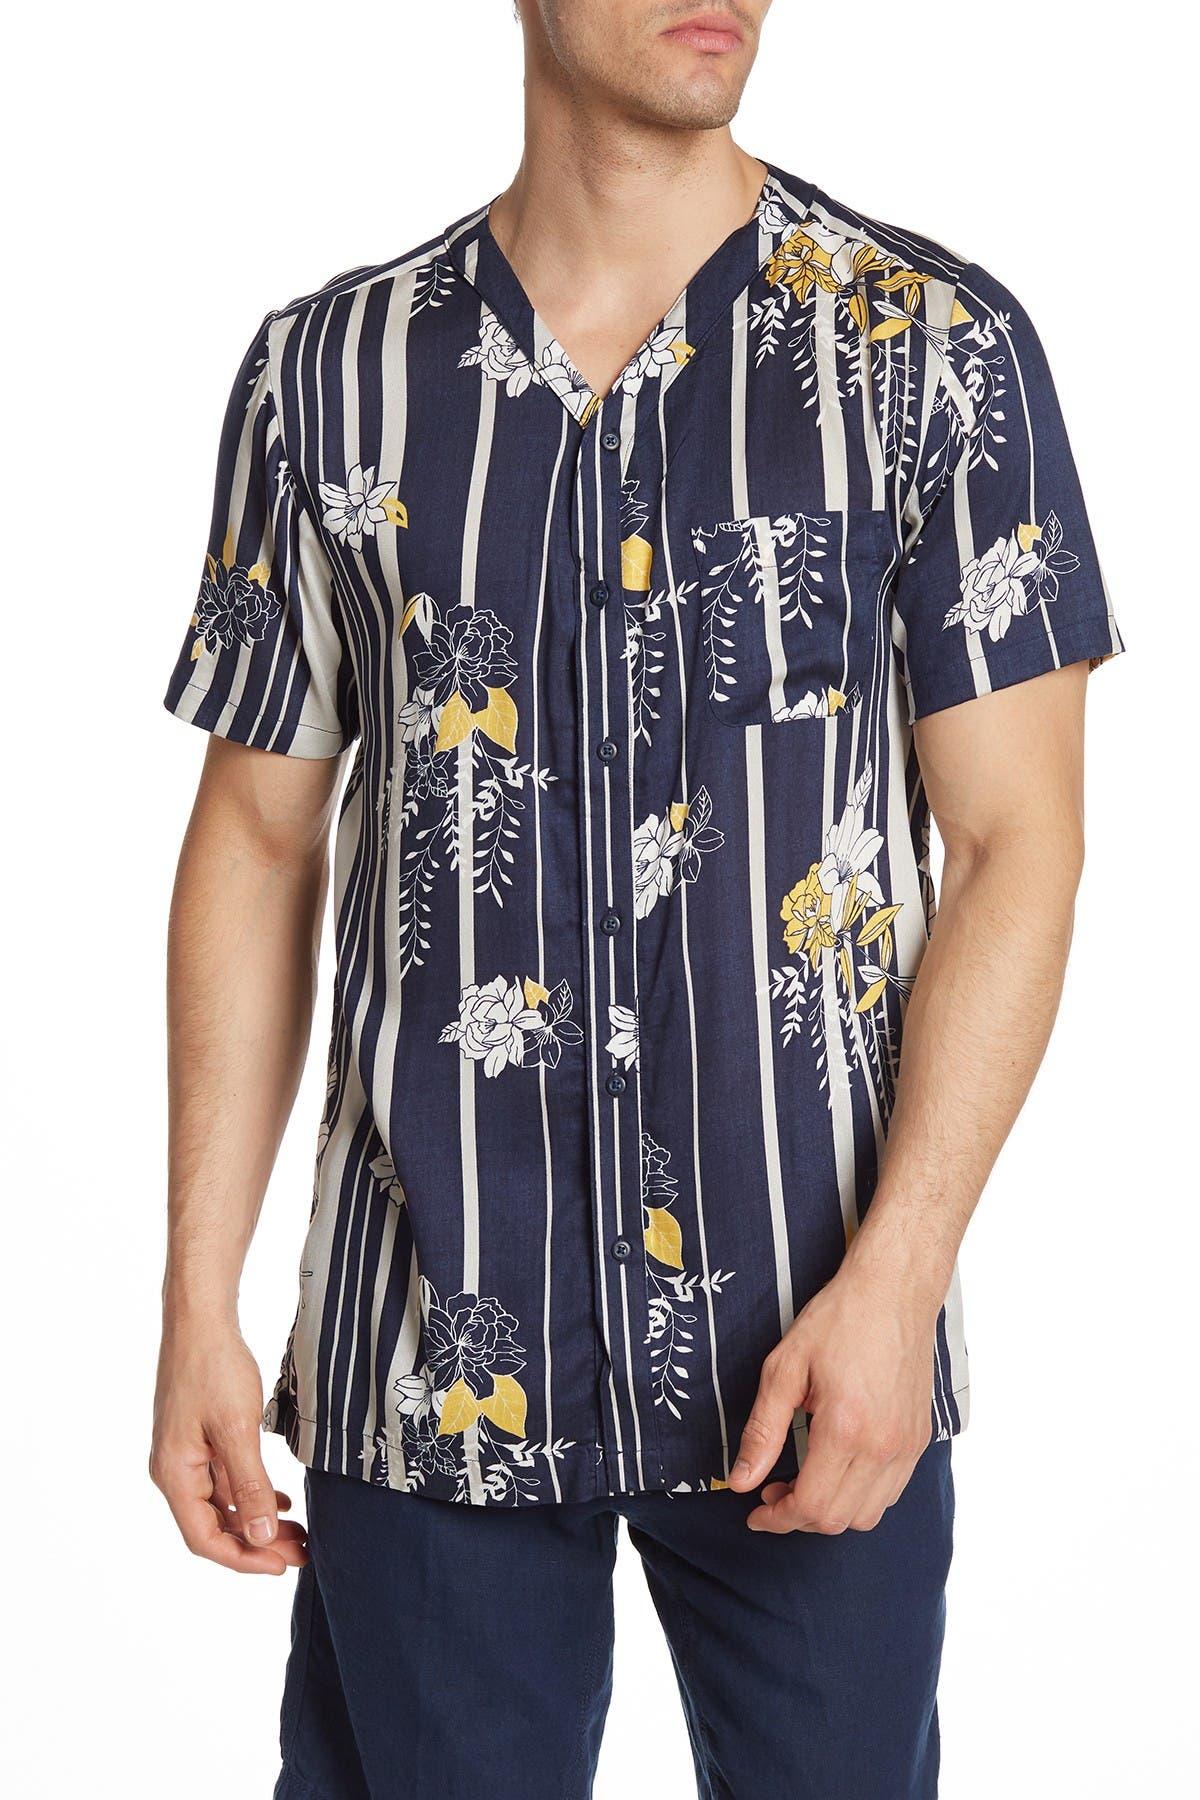 Image of Onia Luca Shirt